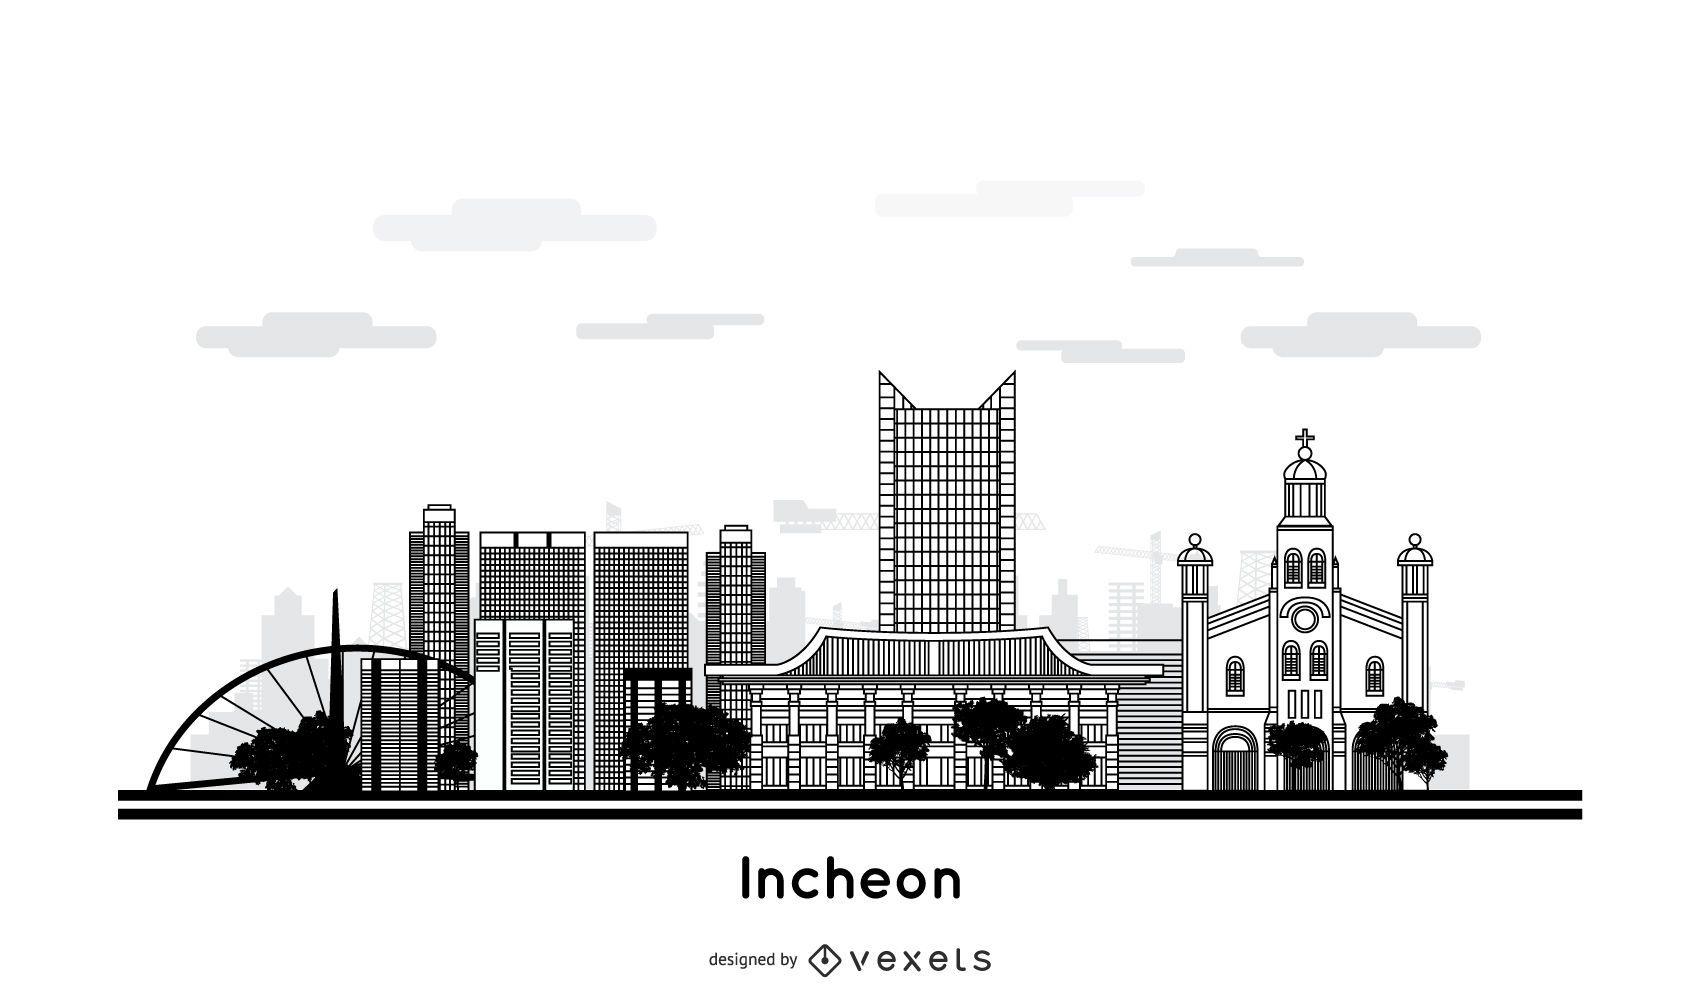 Incheon city skyline design